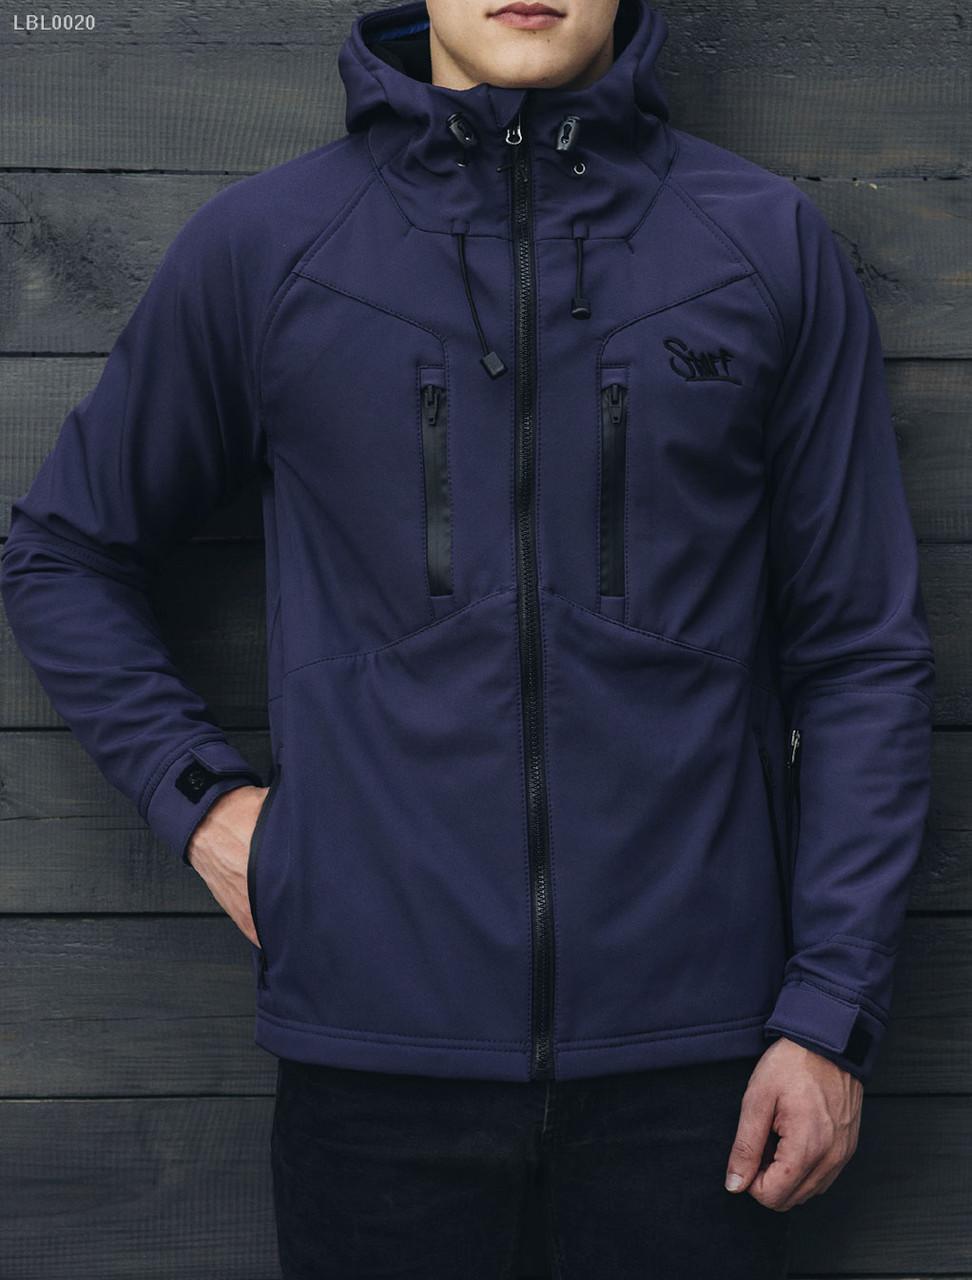 Куртка Staff - Soft shell navy Art. LBL0020 (Размеры - XXL)  заказ ... 1b20faf987f71